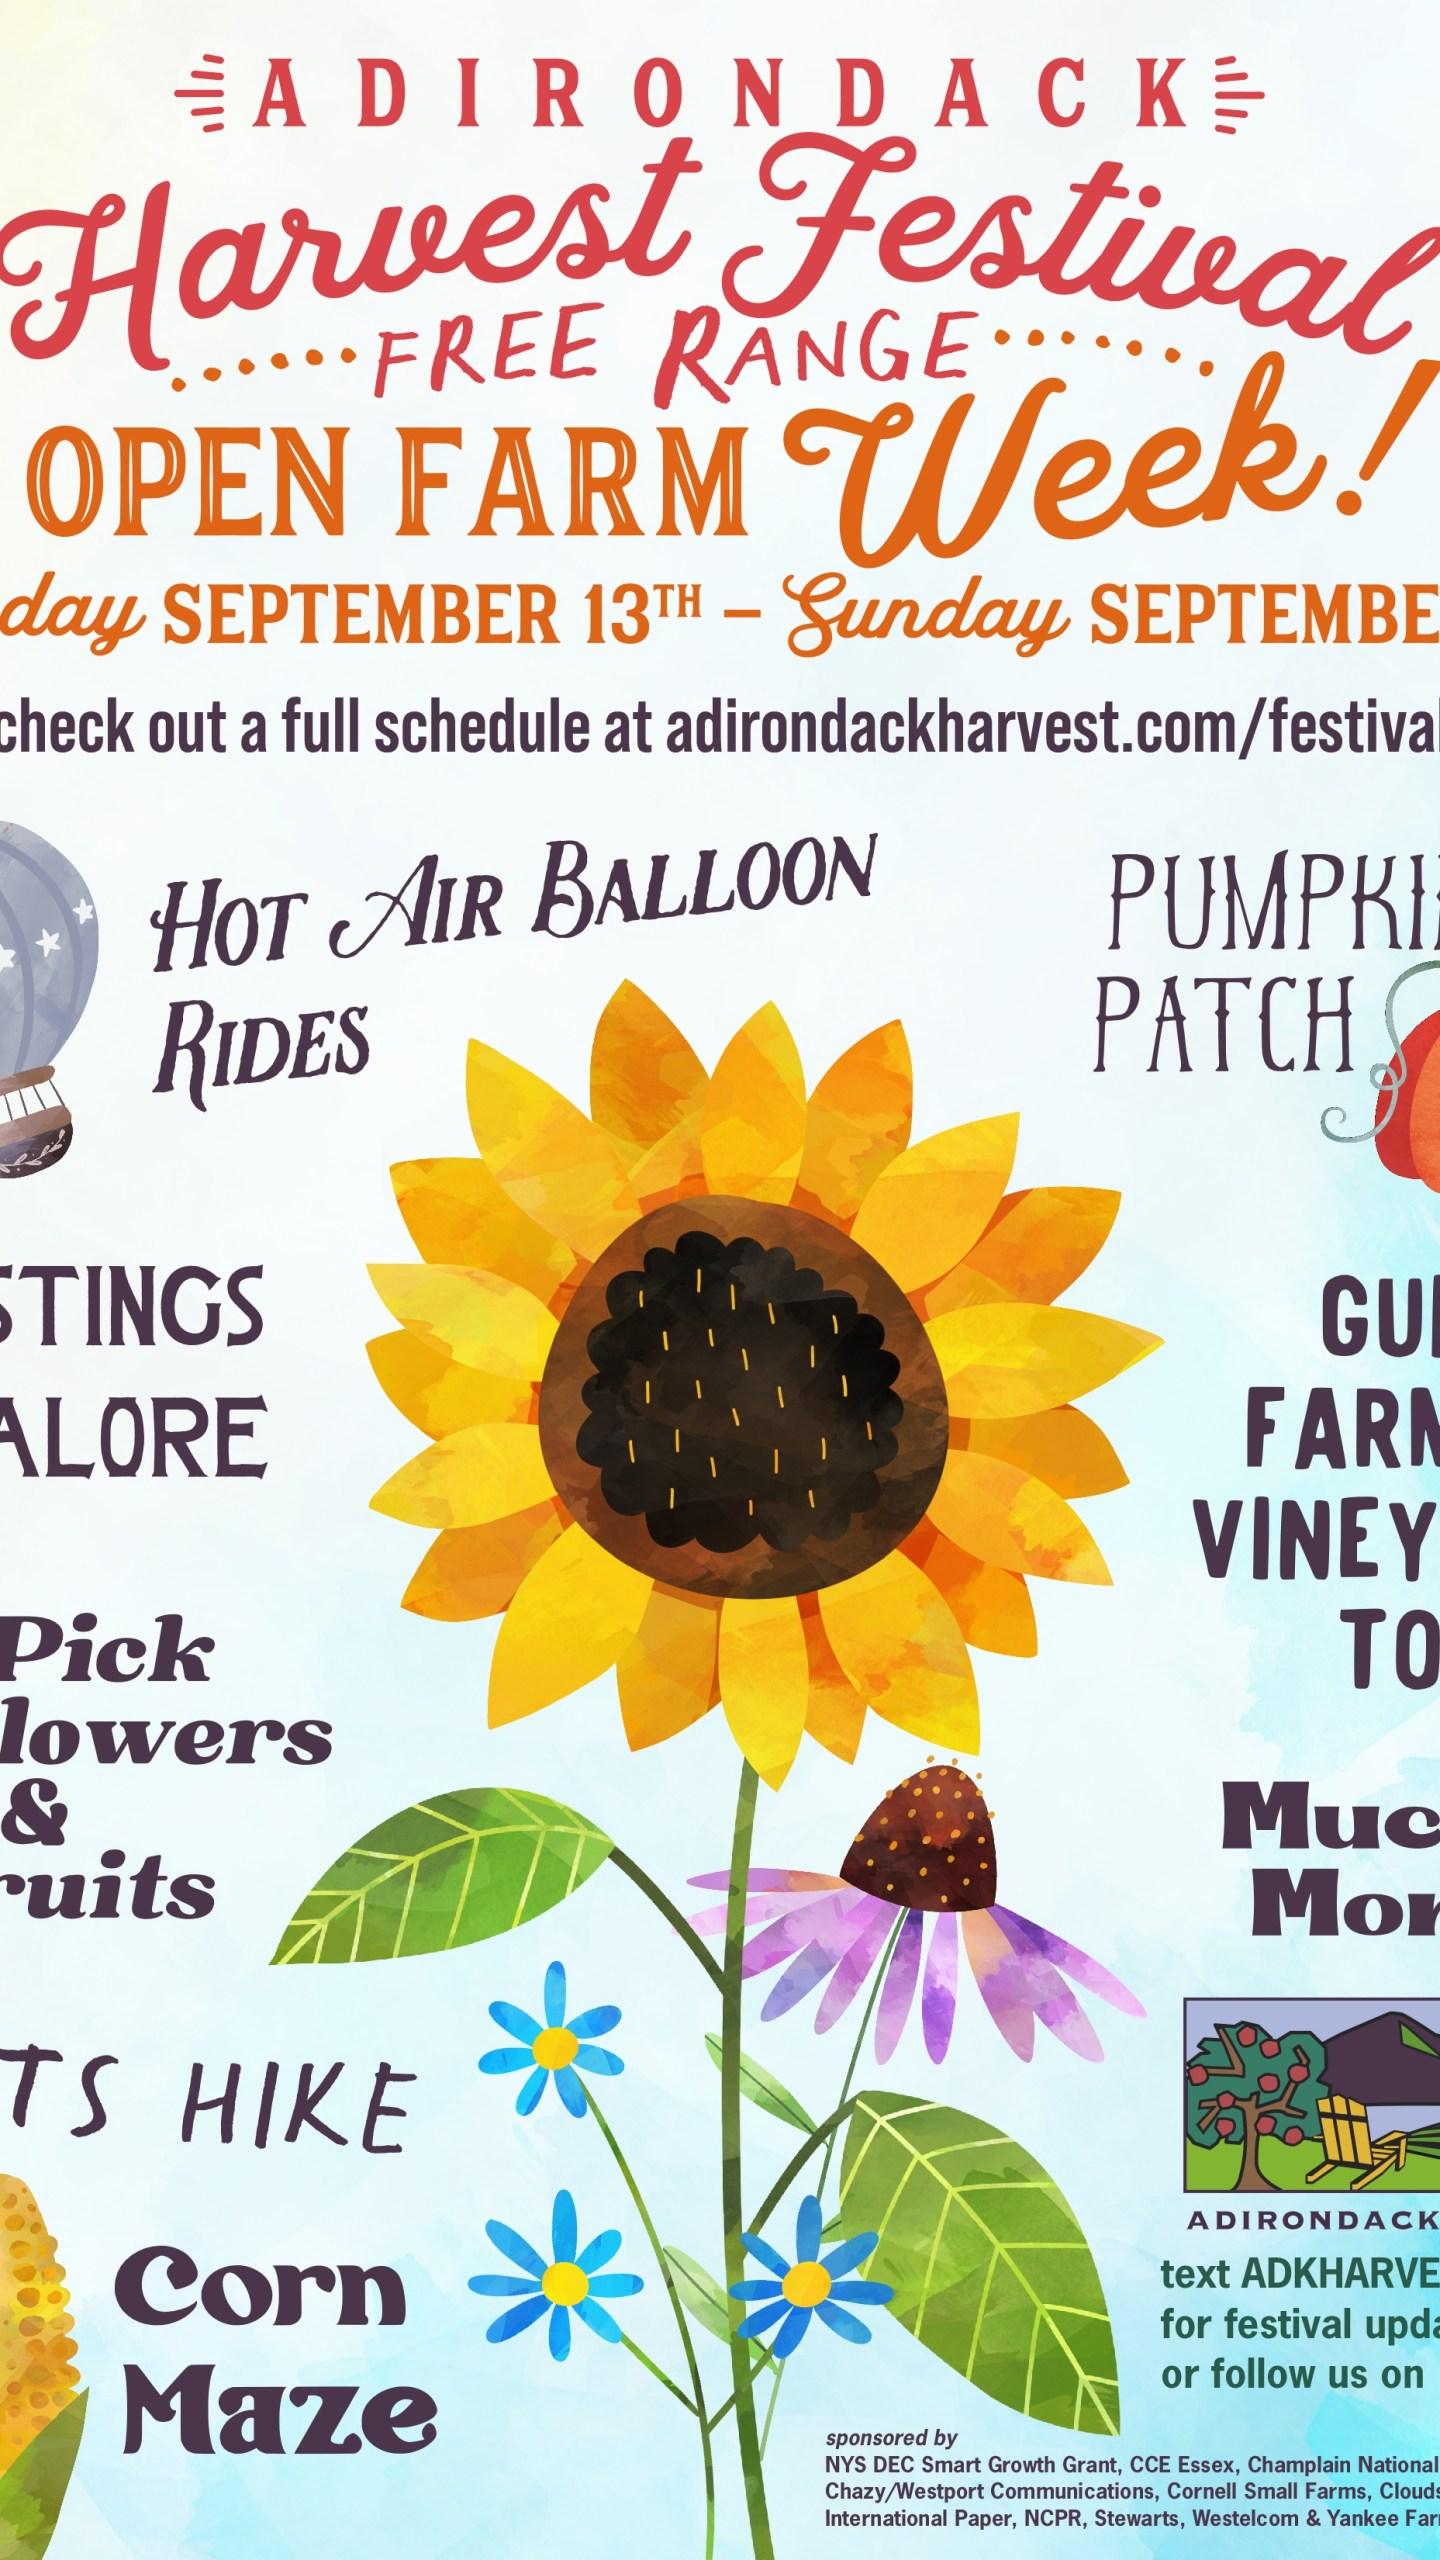 Adirondack Harvest Festival Open Farm Week Poster